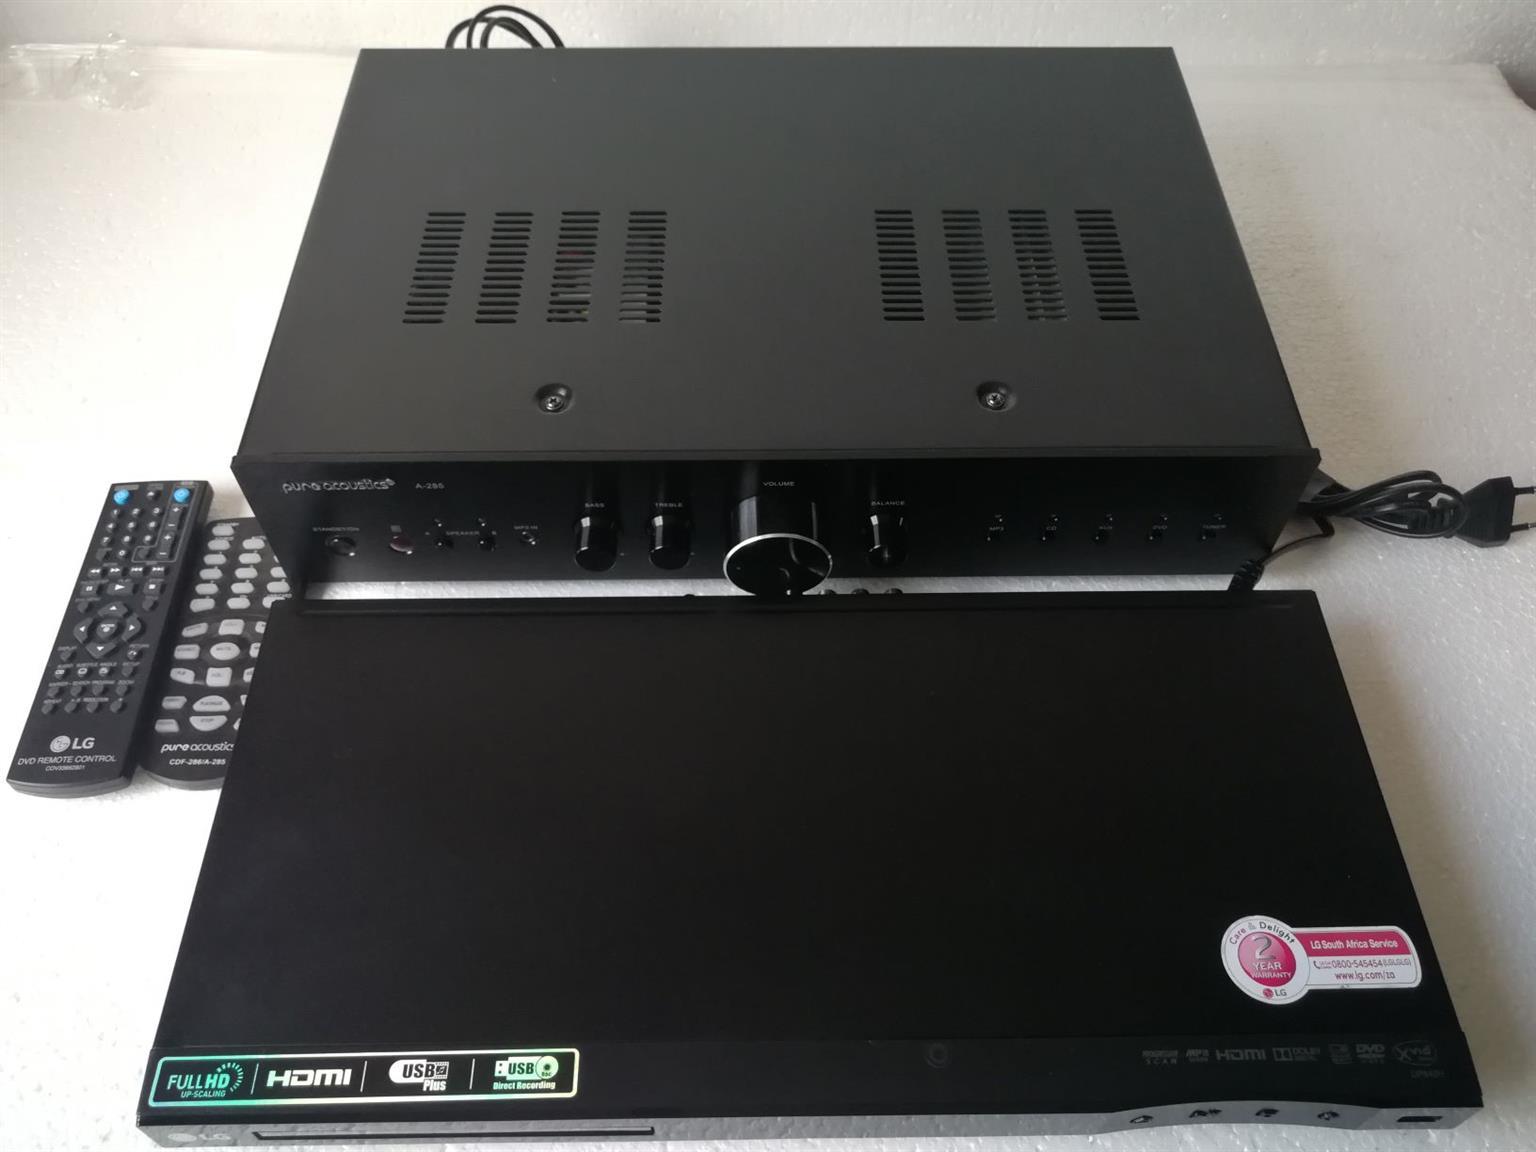 Pure Acoustic Amplifier A285 & LG DVD Player (DP842H)